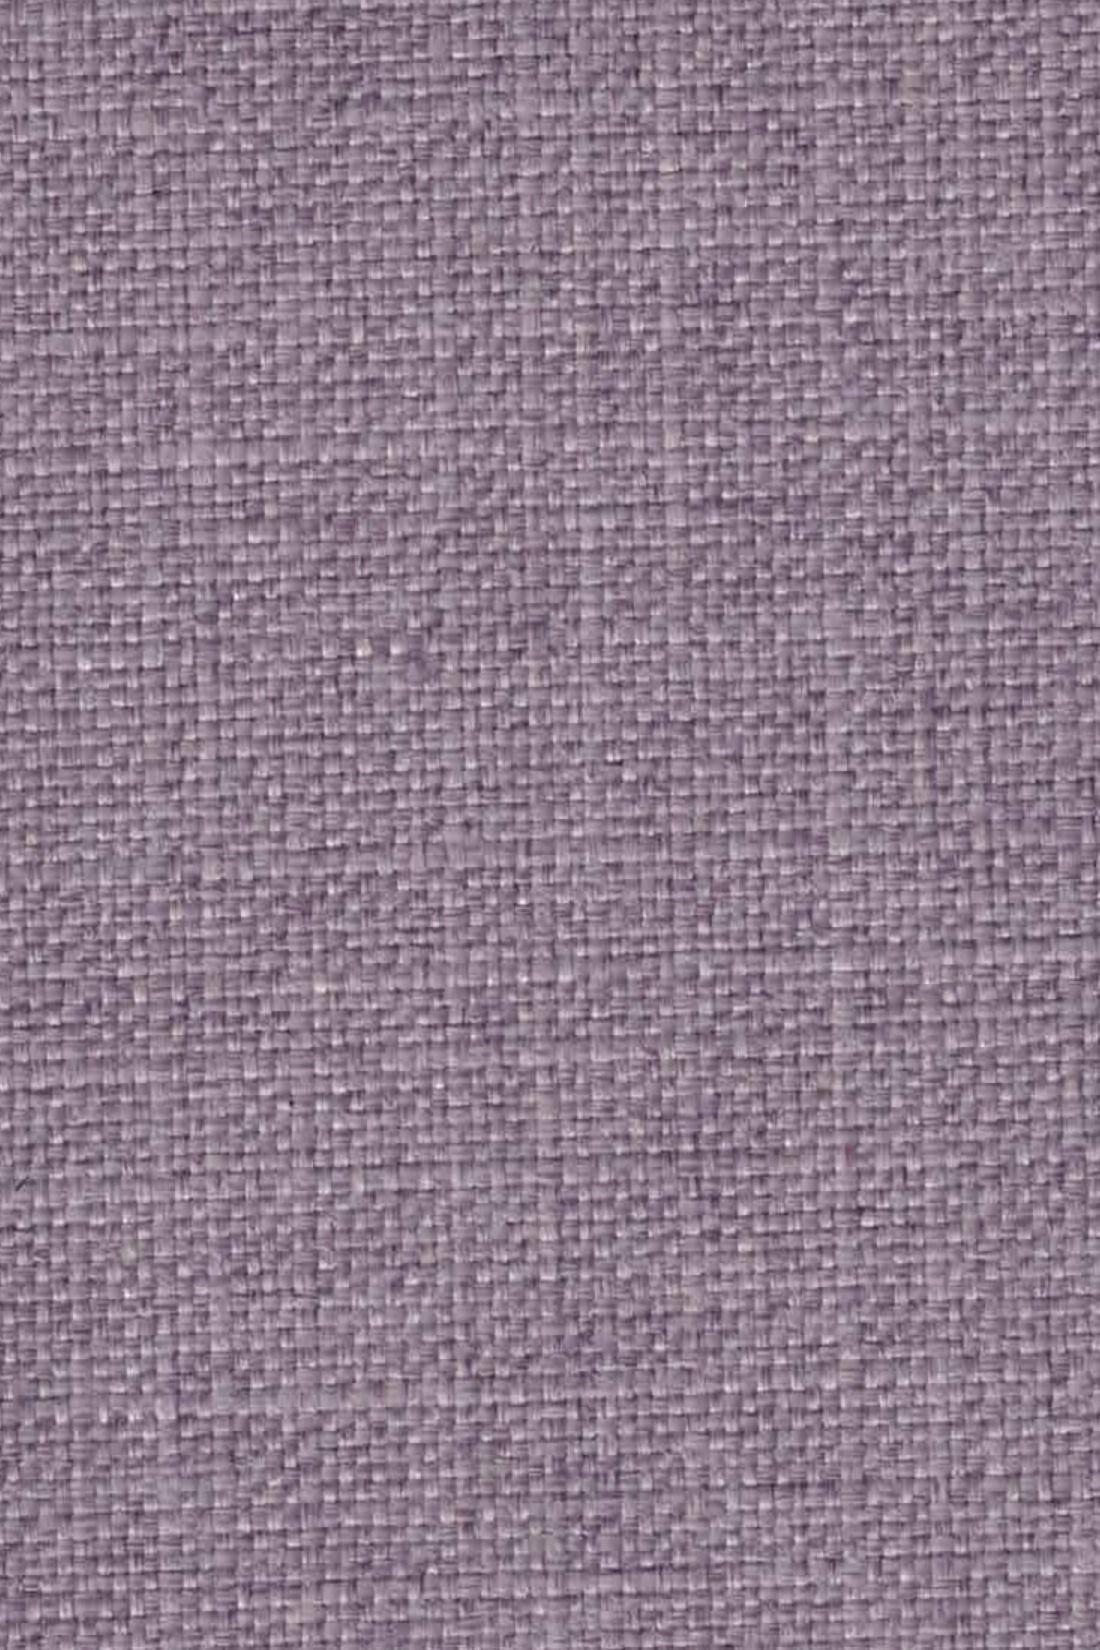 Dune Lavender Performance Upholstery Upholstry Fabric